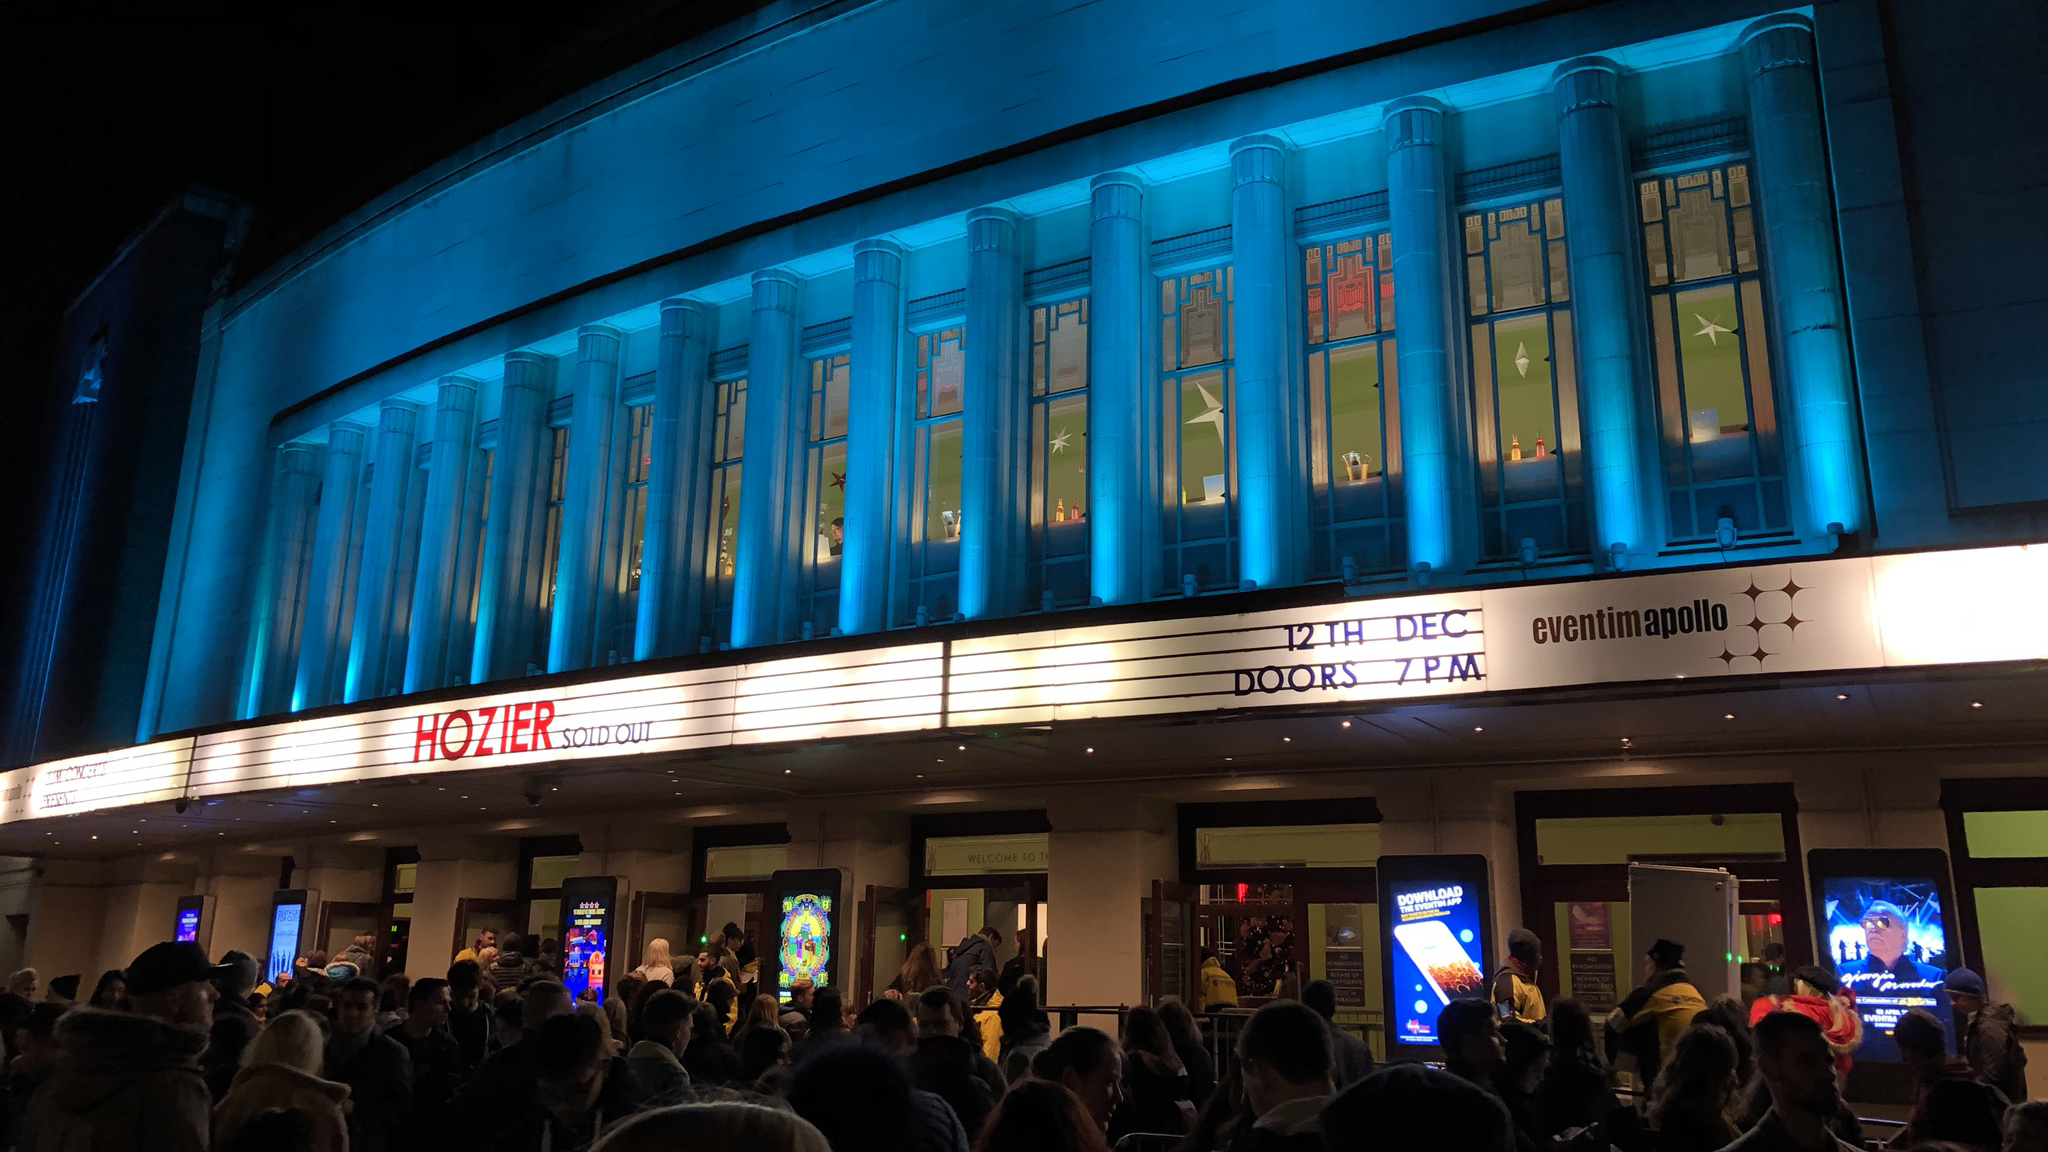 Hozier - Live at the Hammersmith Apollo (12-Dec-2018).jpeg